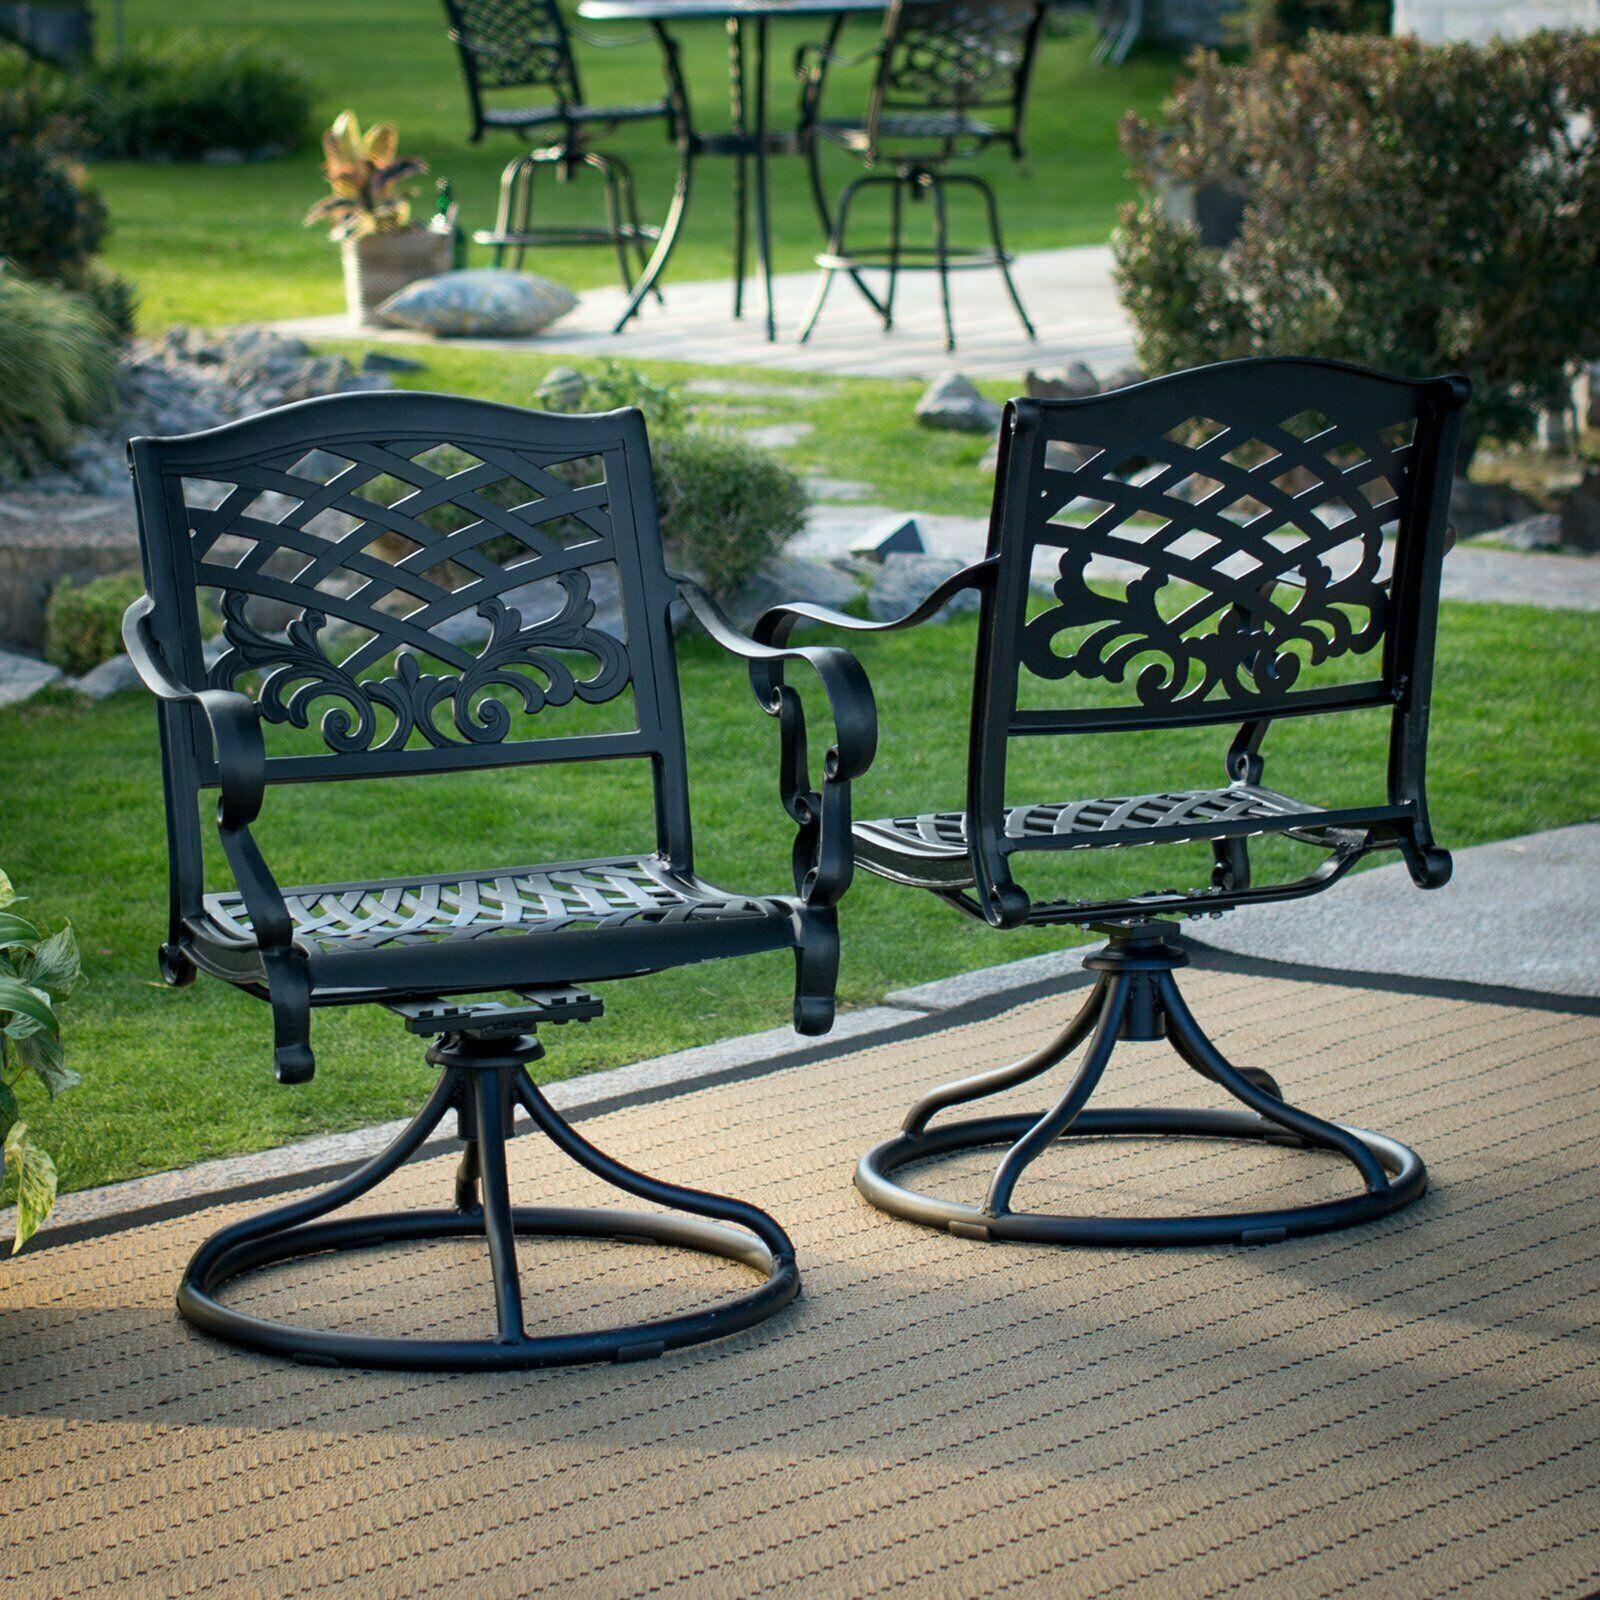 Outdoor Chairs Set of 2 Black Cast Aluminum Patio Dining Swi